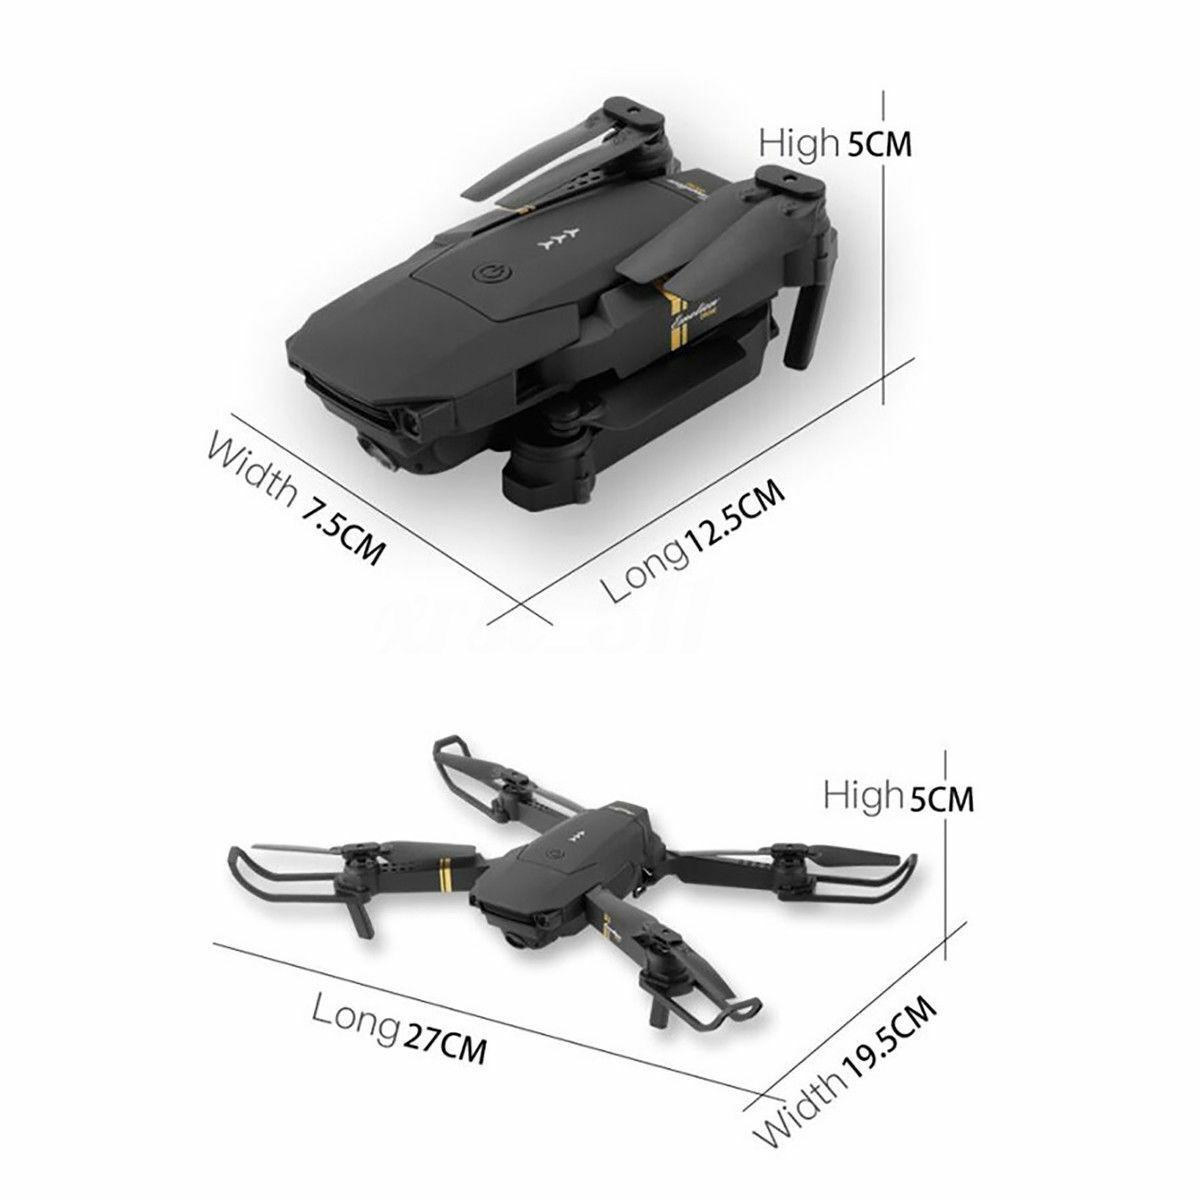 Cooligg S168 FPV Wifi HD Camer...